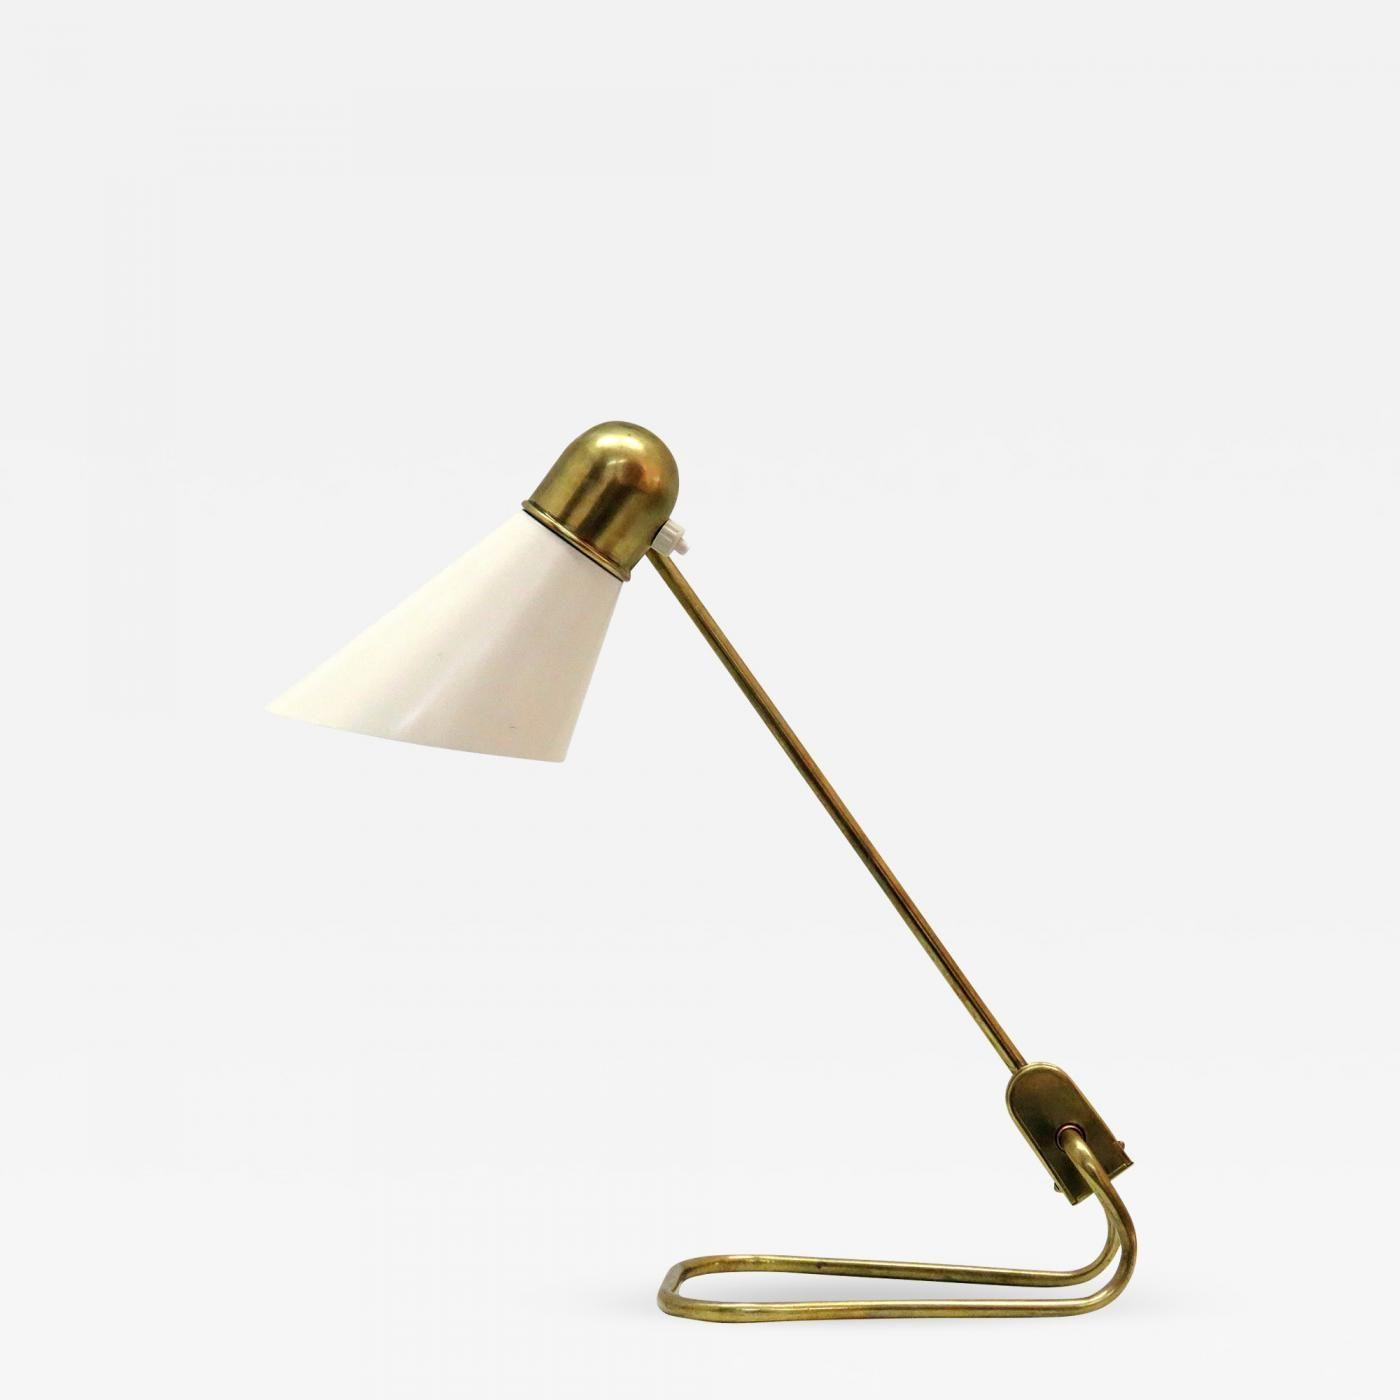 Franzosisch Tabelle Lampen Lampentisch Lampen Innenausstattung